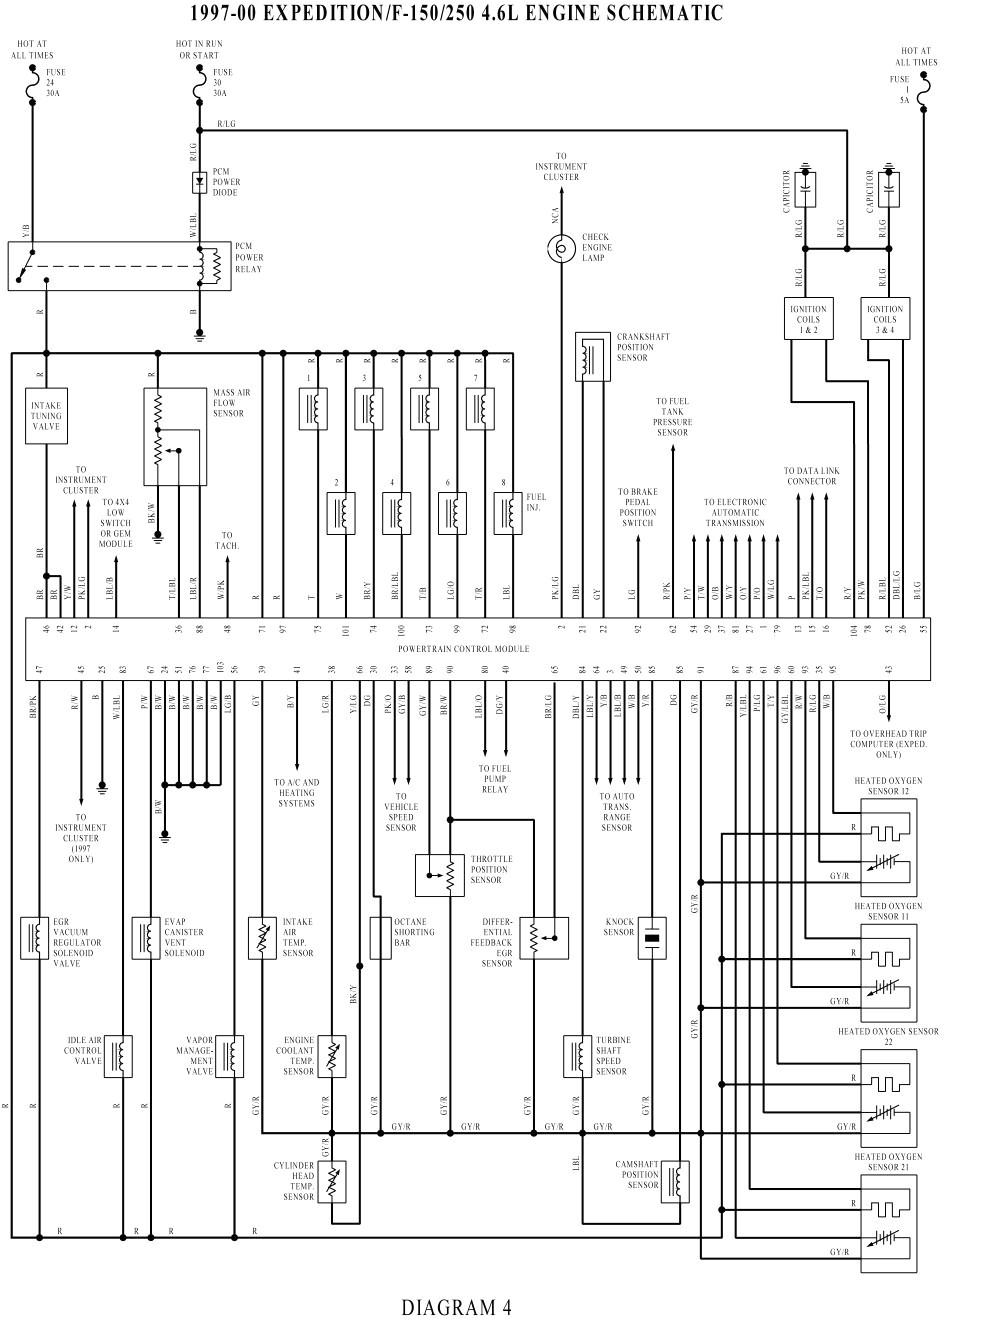 2000 expedition wiring diagram blog wiring diagram 2000 ford expedition engine wiring wiring diagram operations 2000